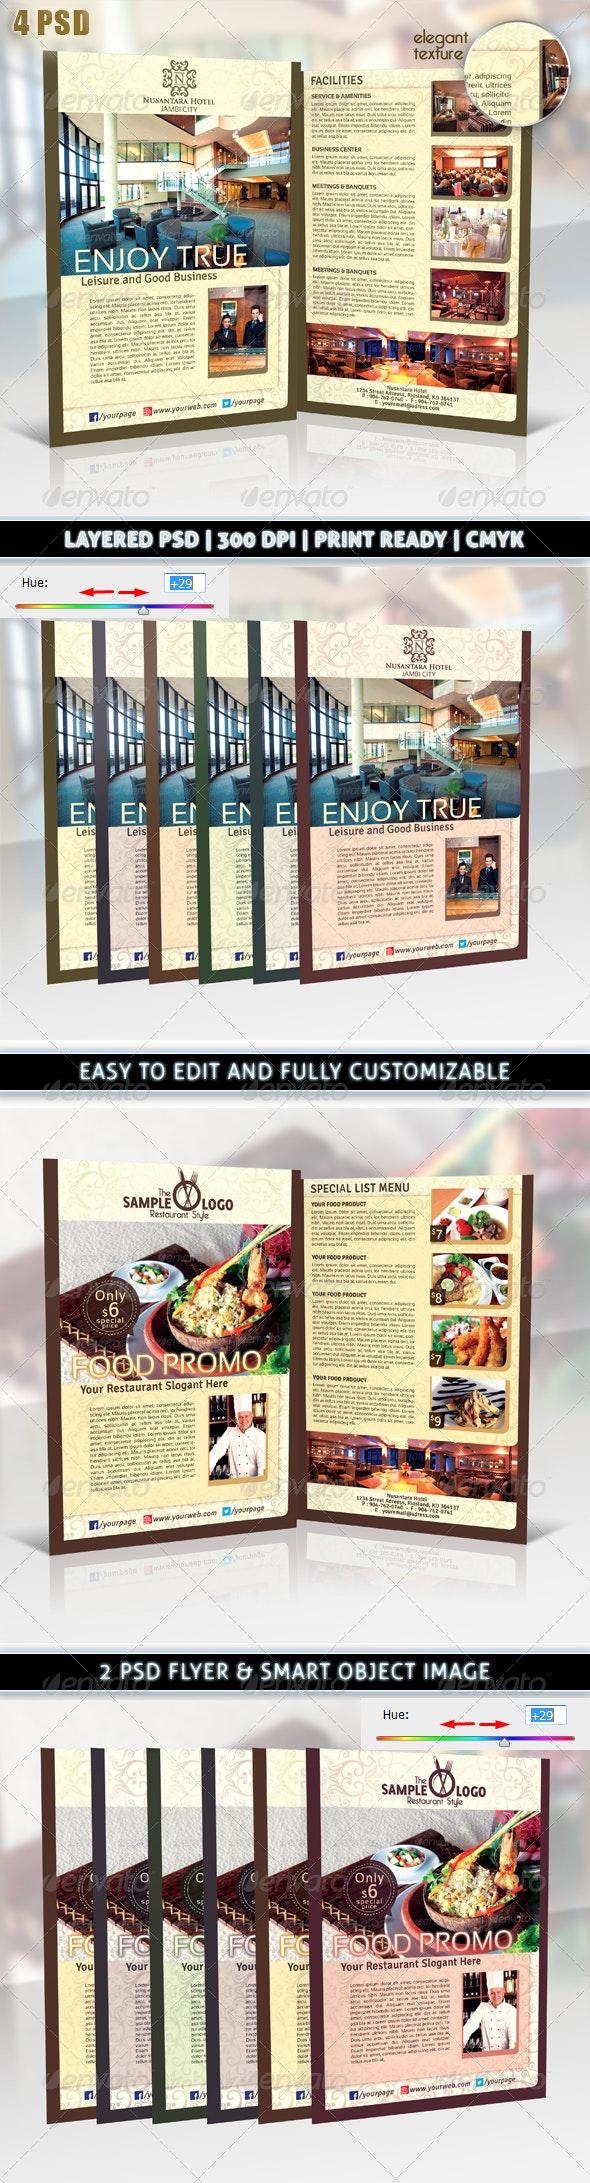 Hotel or Restaurant Elegant Promotion Flyer - Corporate Flyers